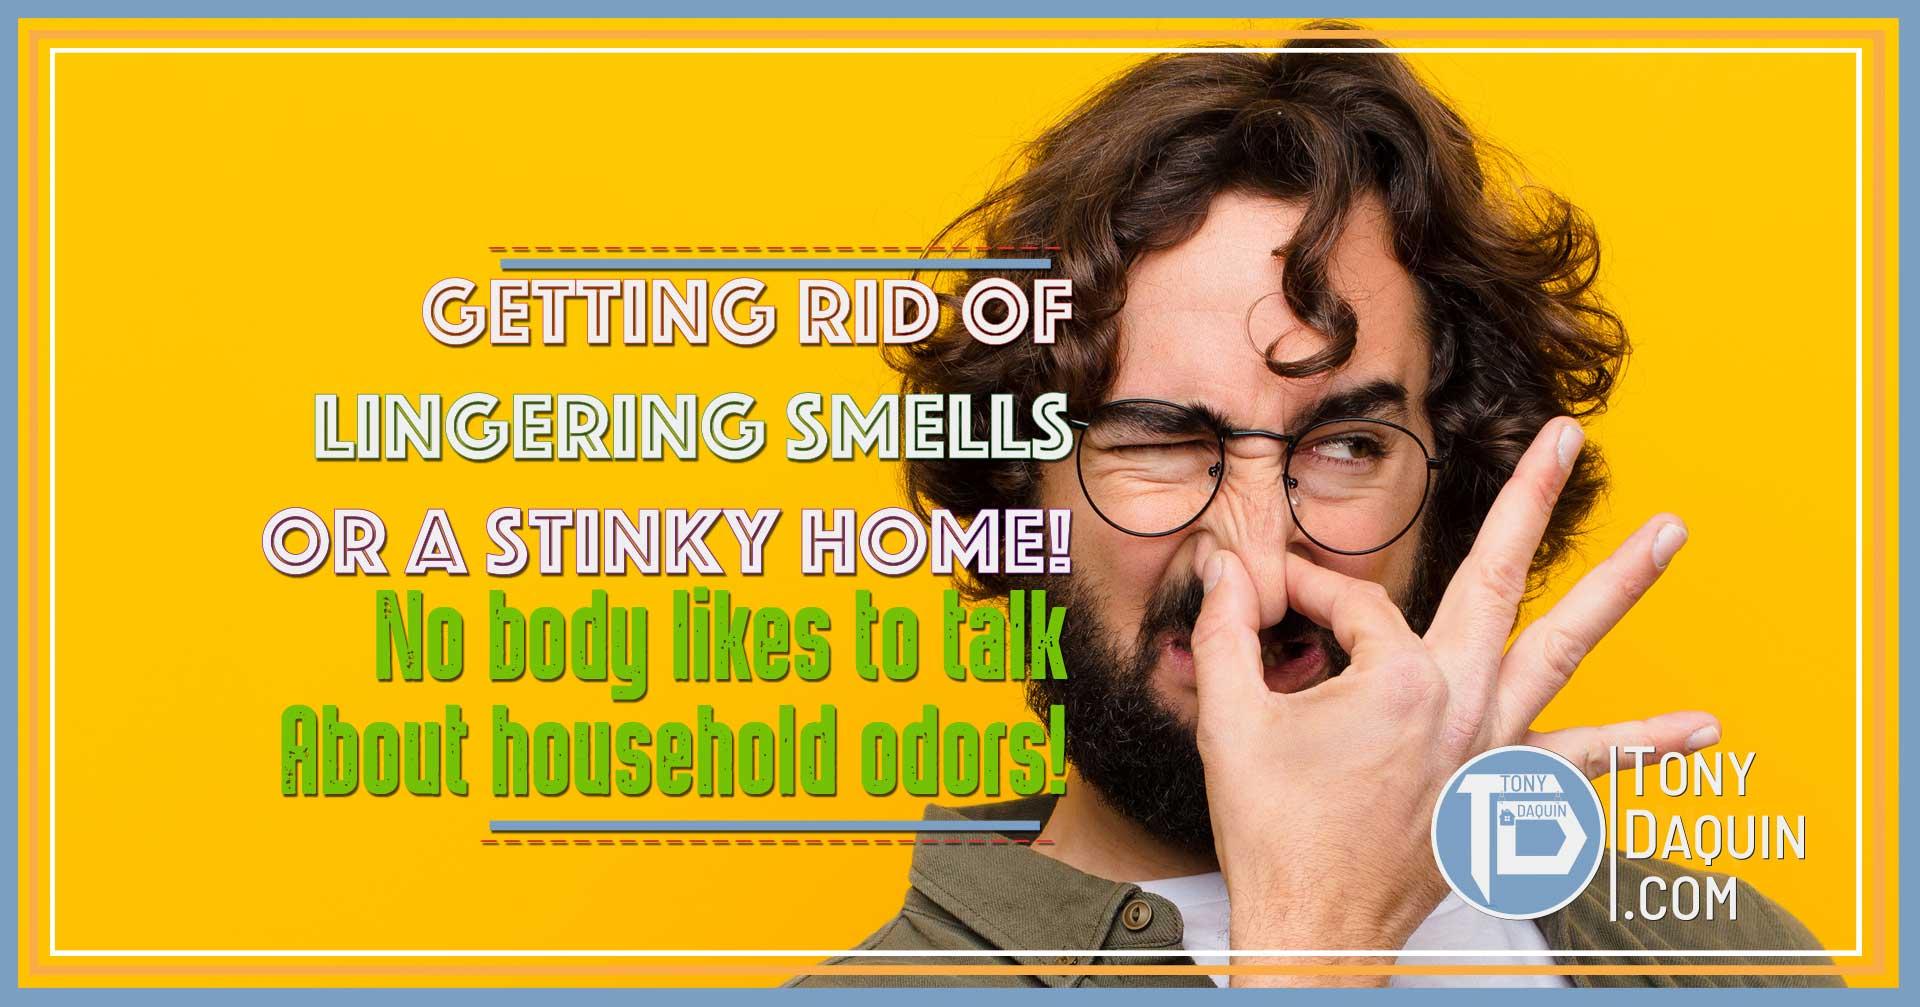 Stinky Home